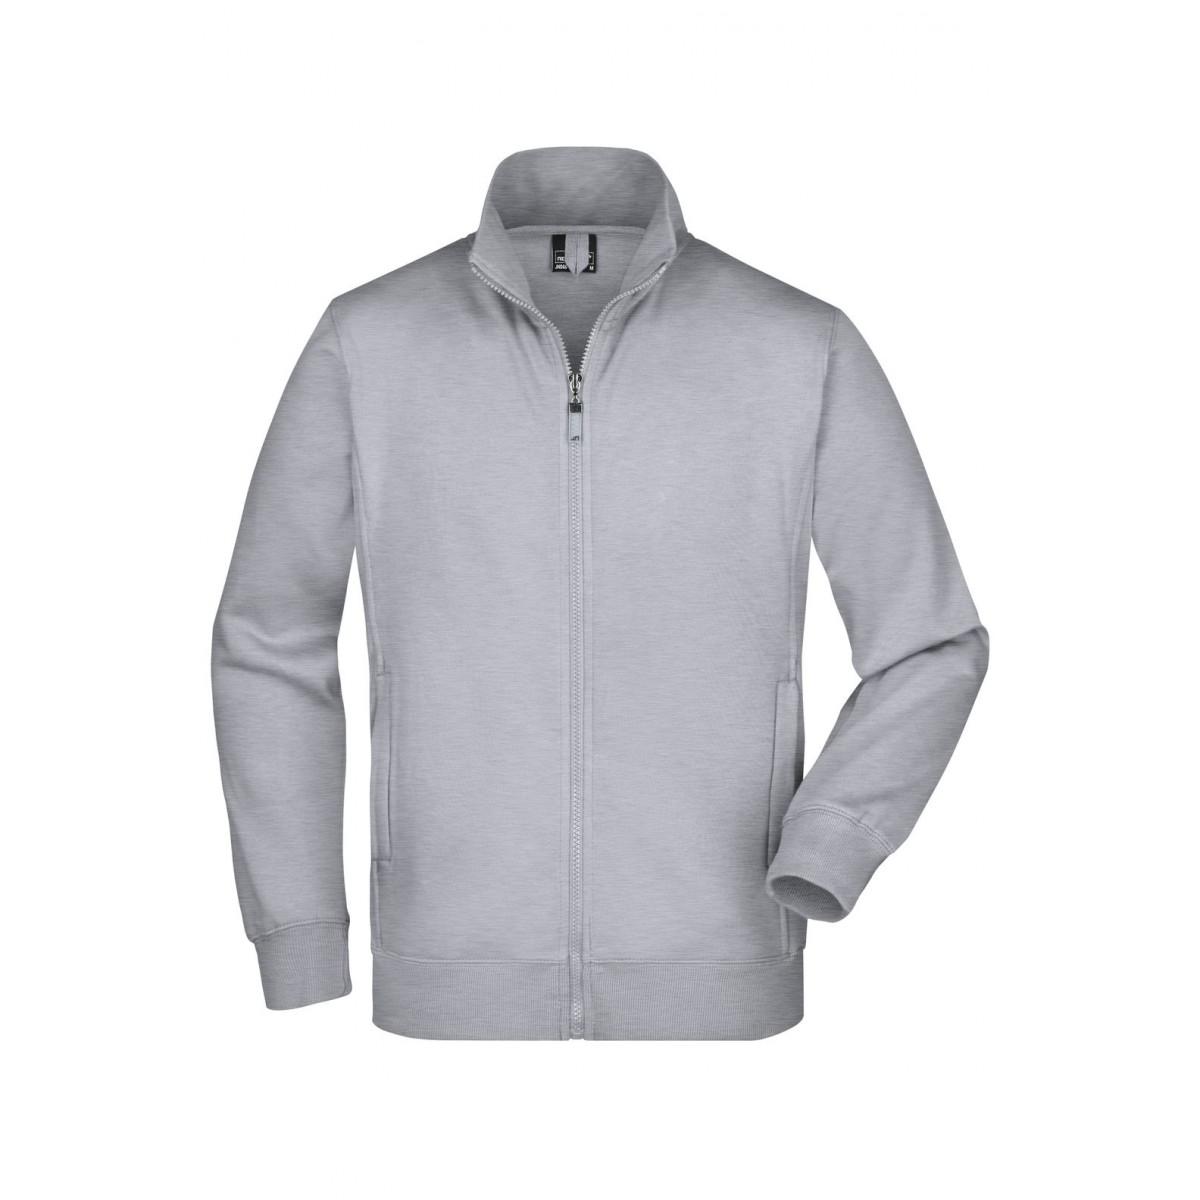 Толстовка мужская JN046 Mens Jacket - Серый меланж